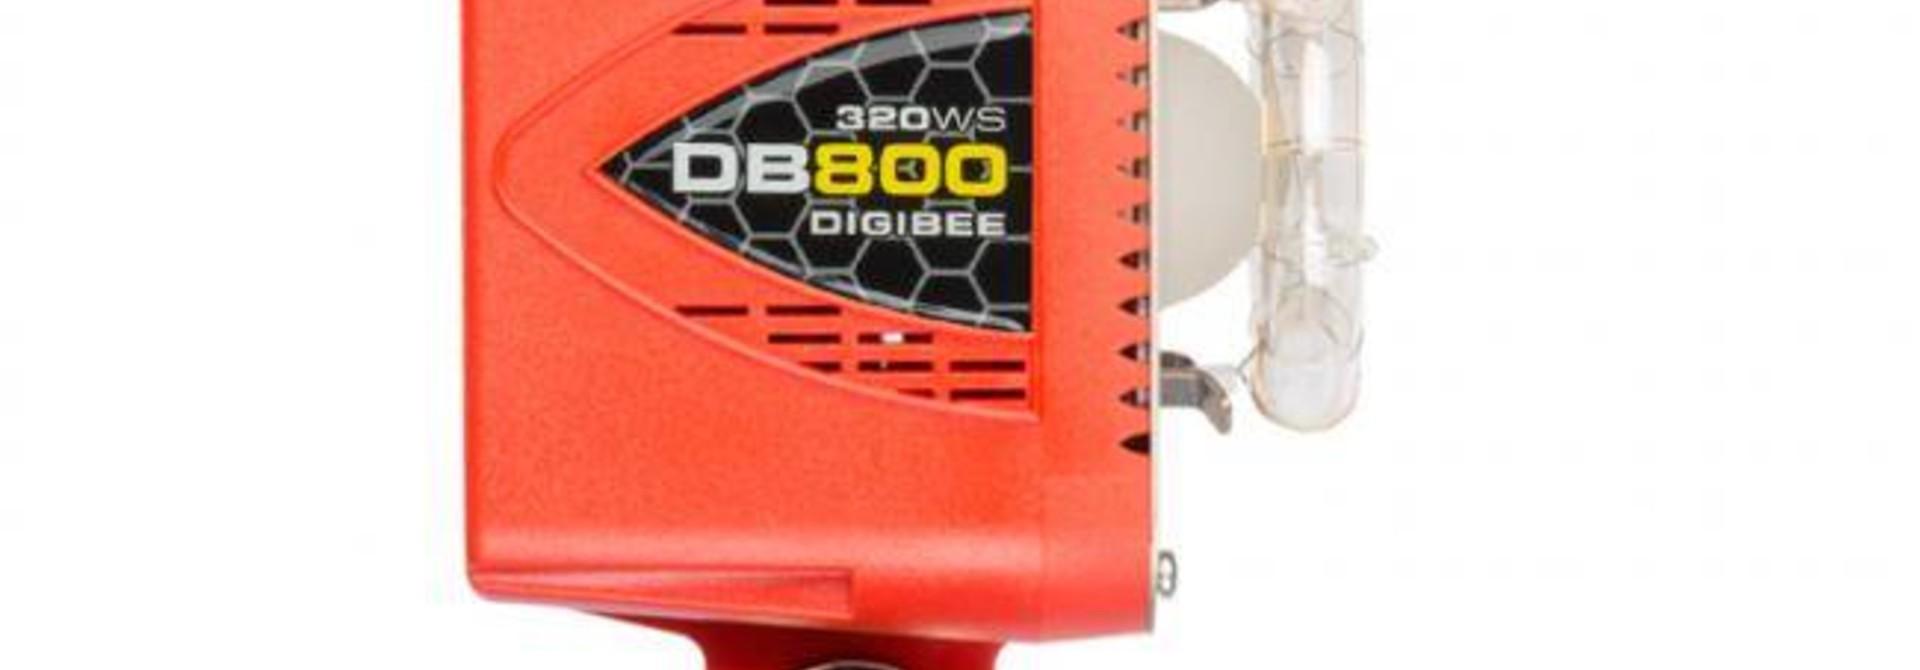 DigiBee Studioblitz - DB800